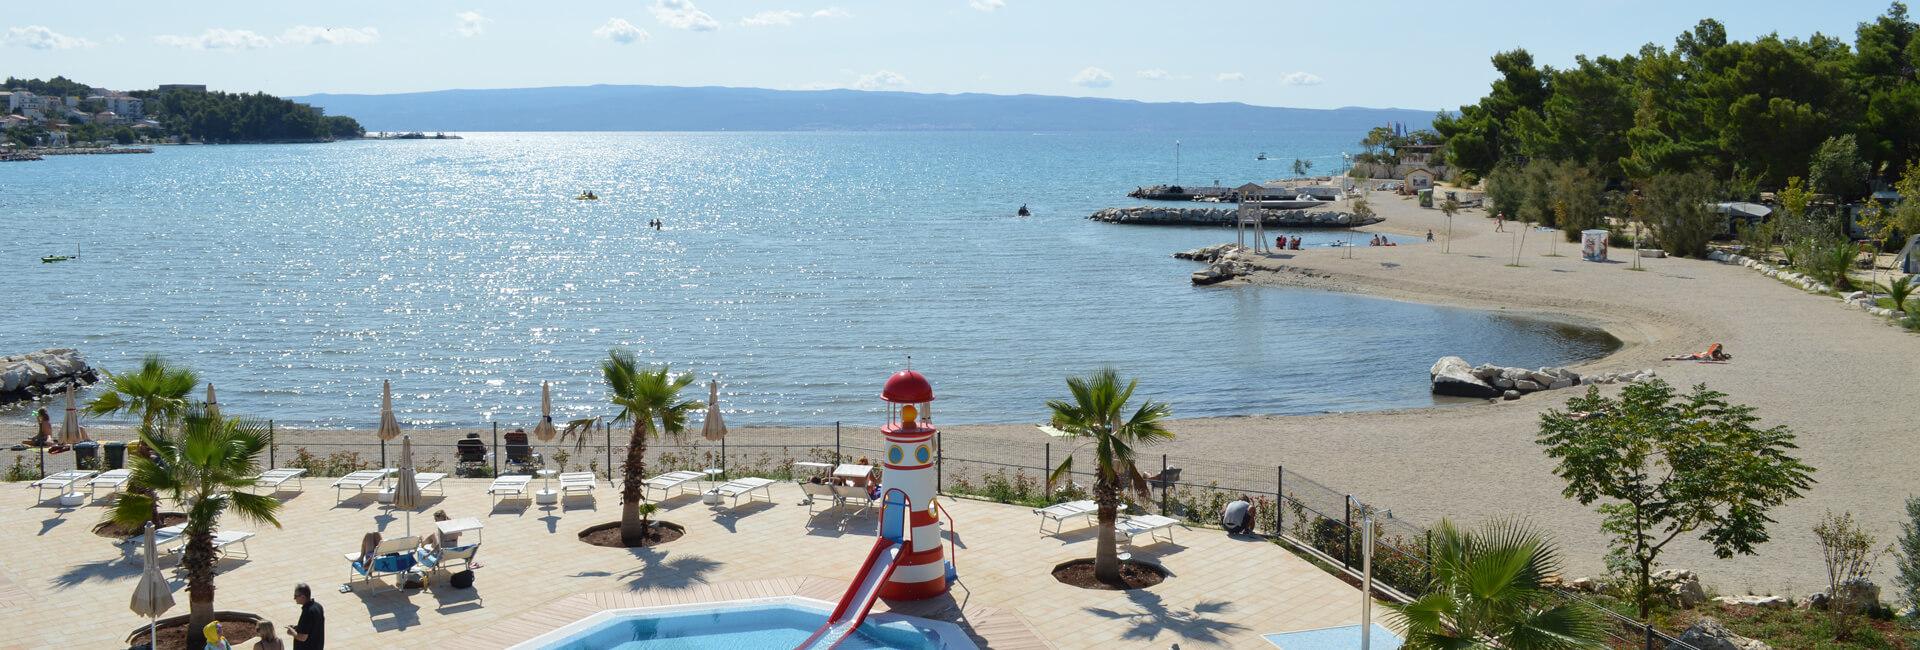 Camping Stobrec Split pool and beach